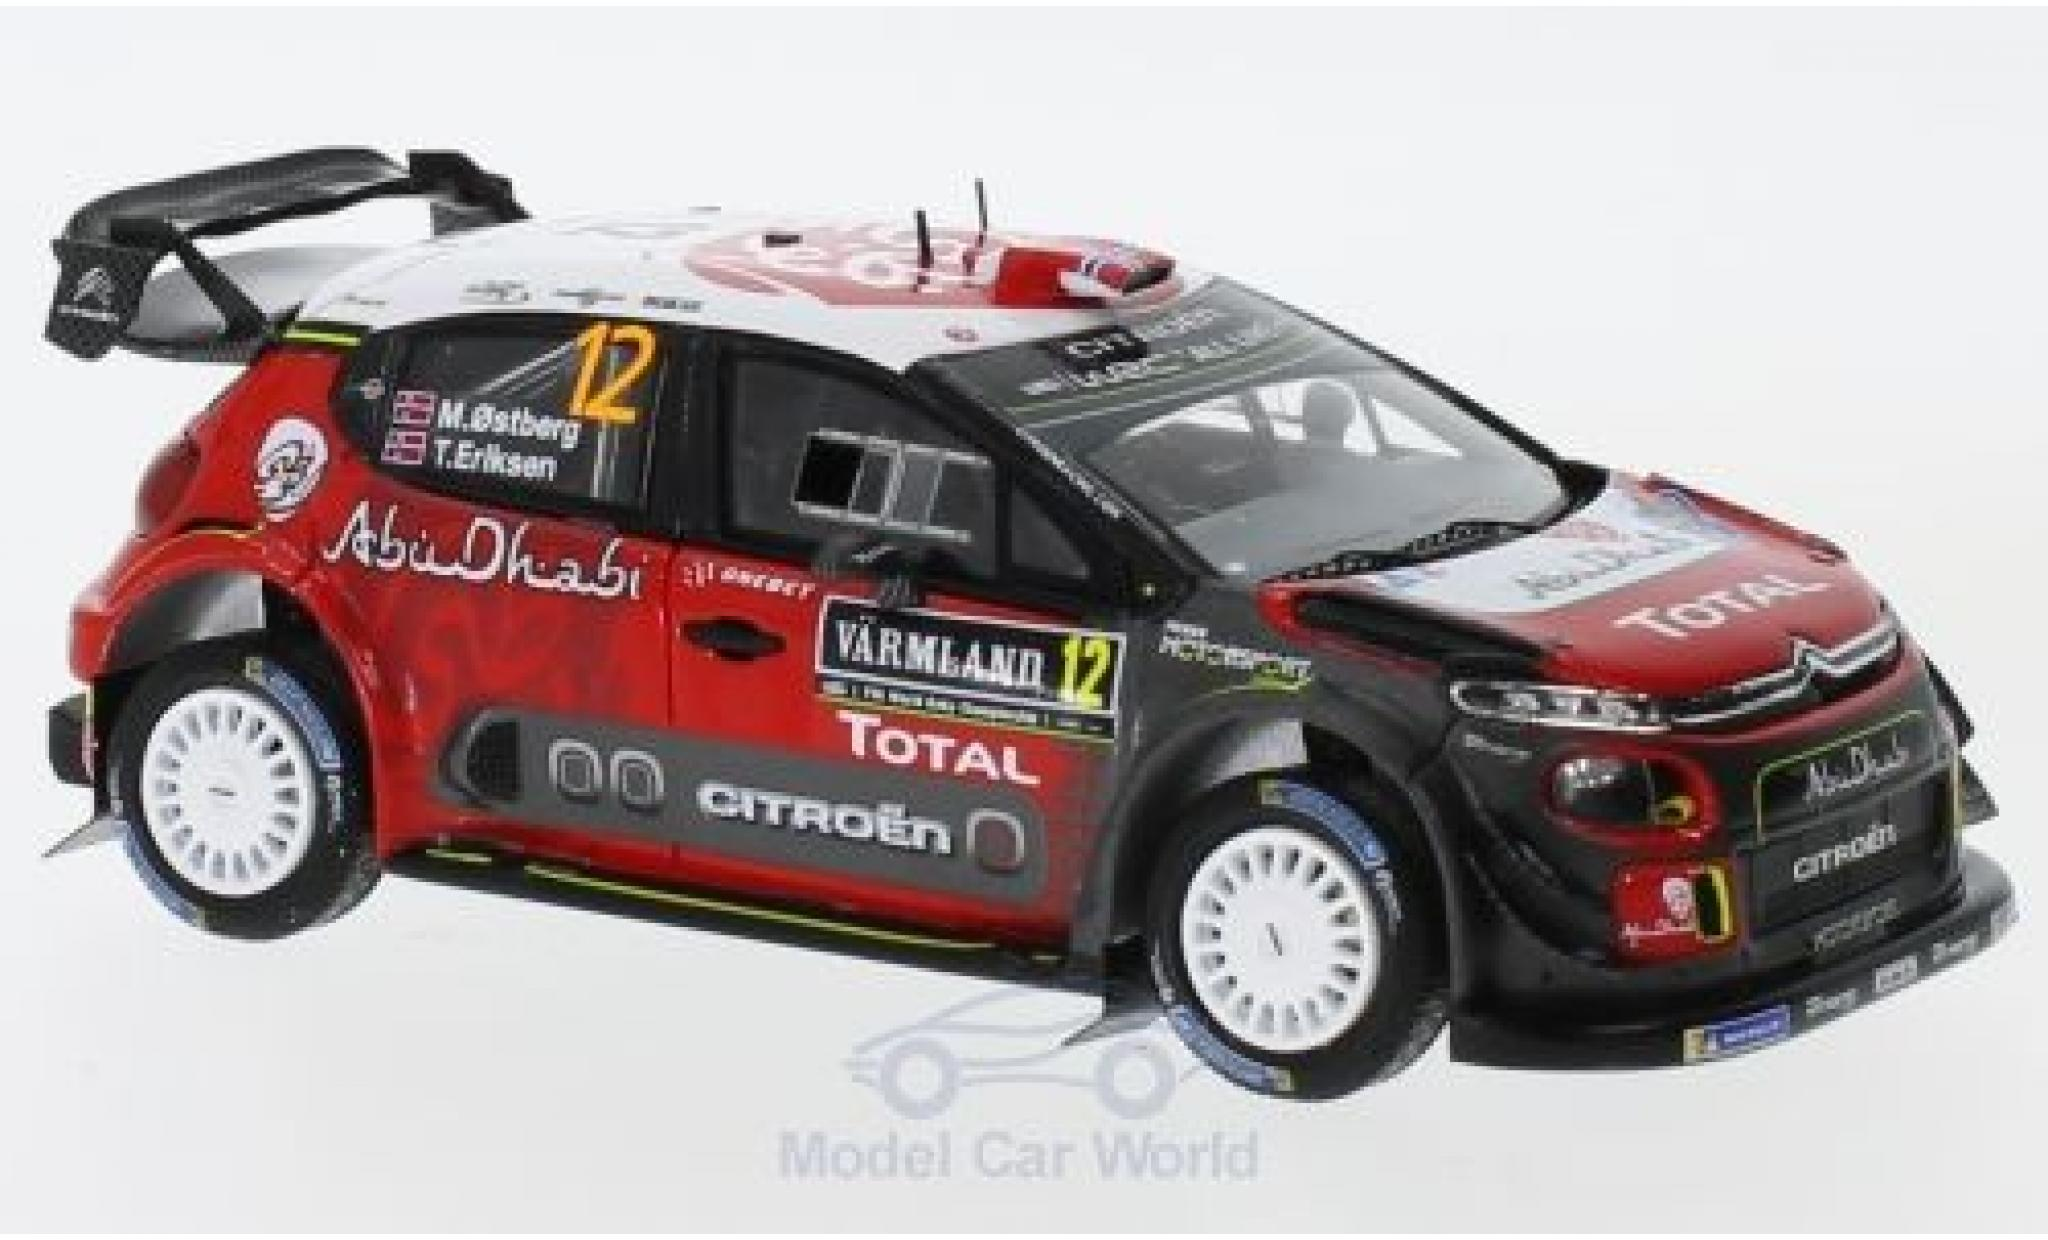 Citroen C3 1/43 Spark WRC No.12 Total Abu Dhabi World Rally Team Rallye WM Rallye Schweden 2018 M.Ostberg/T.Eriksen